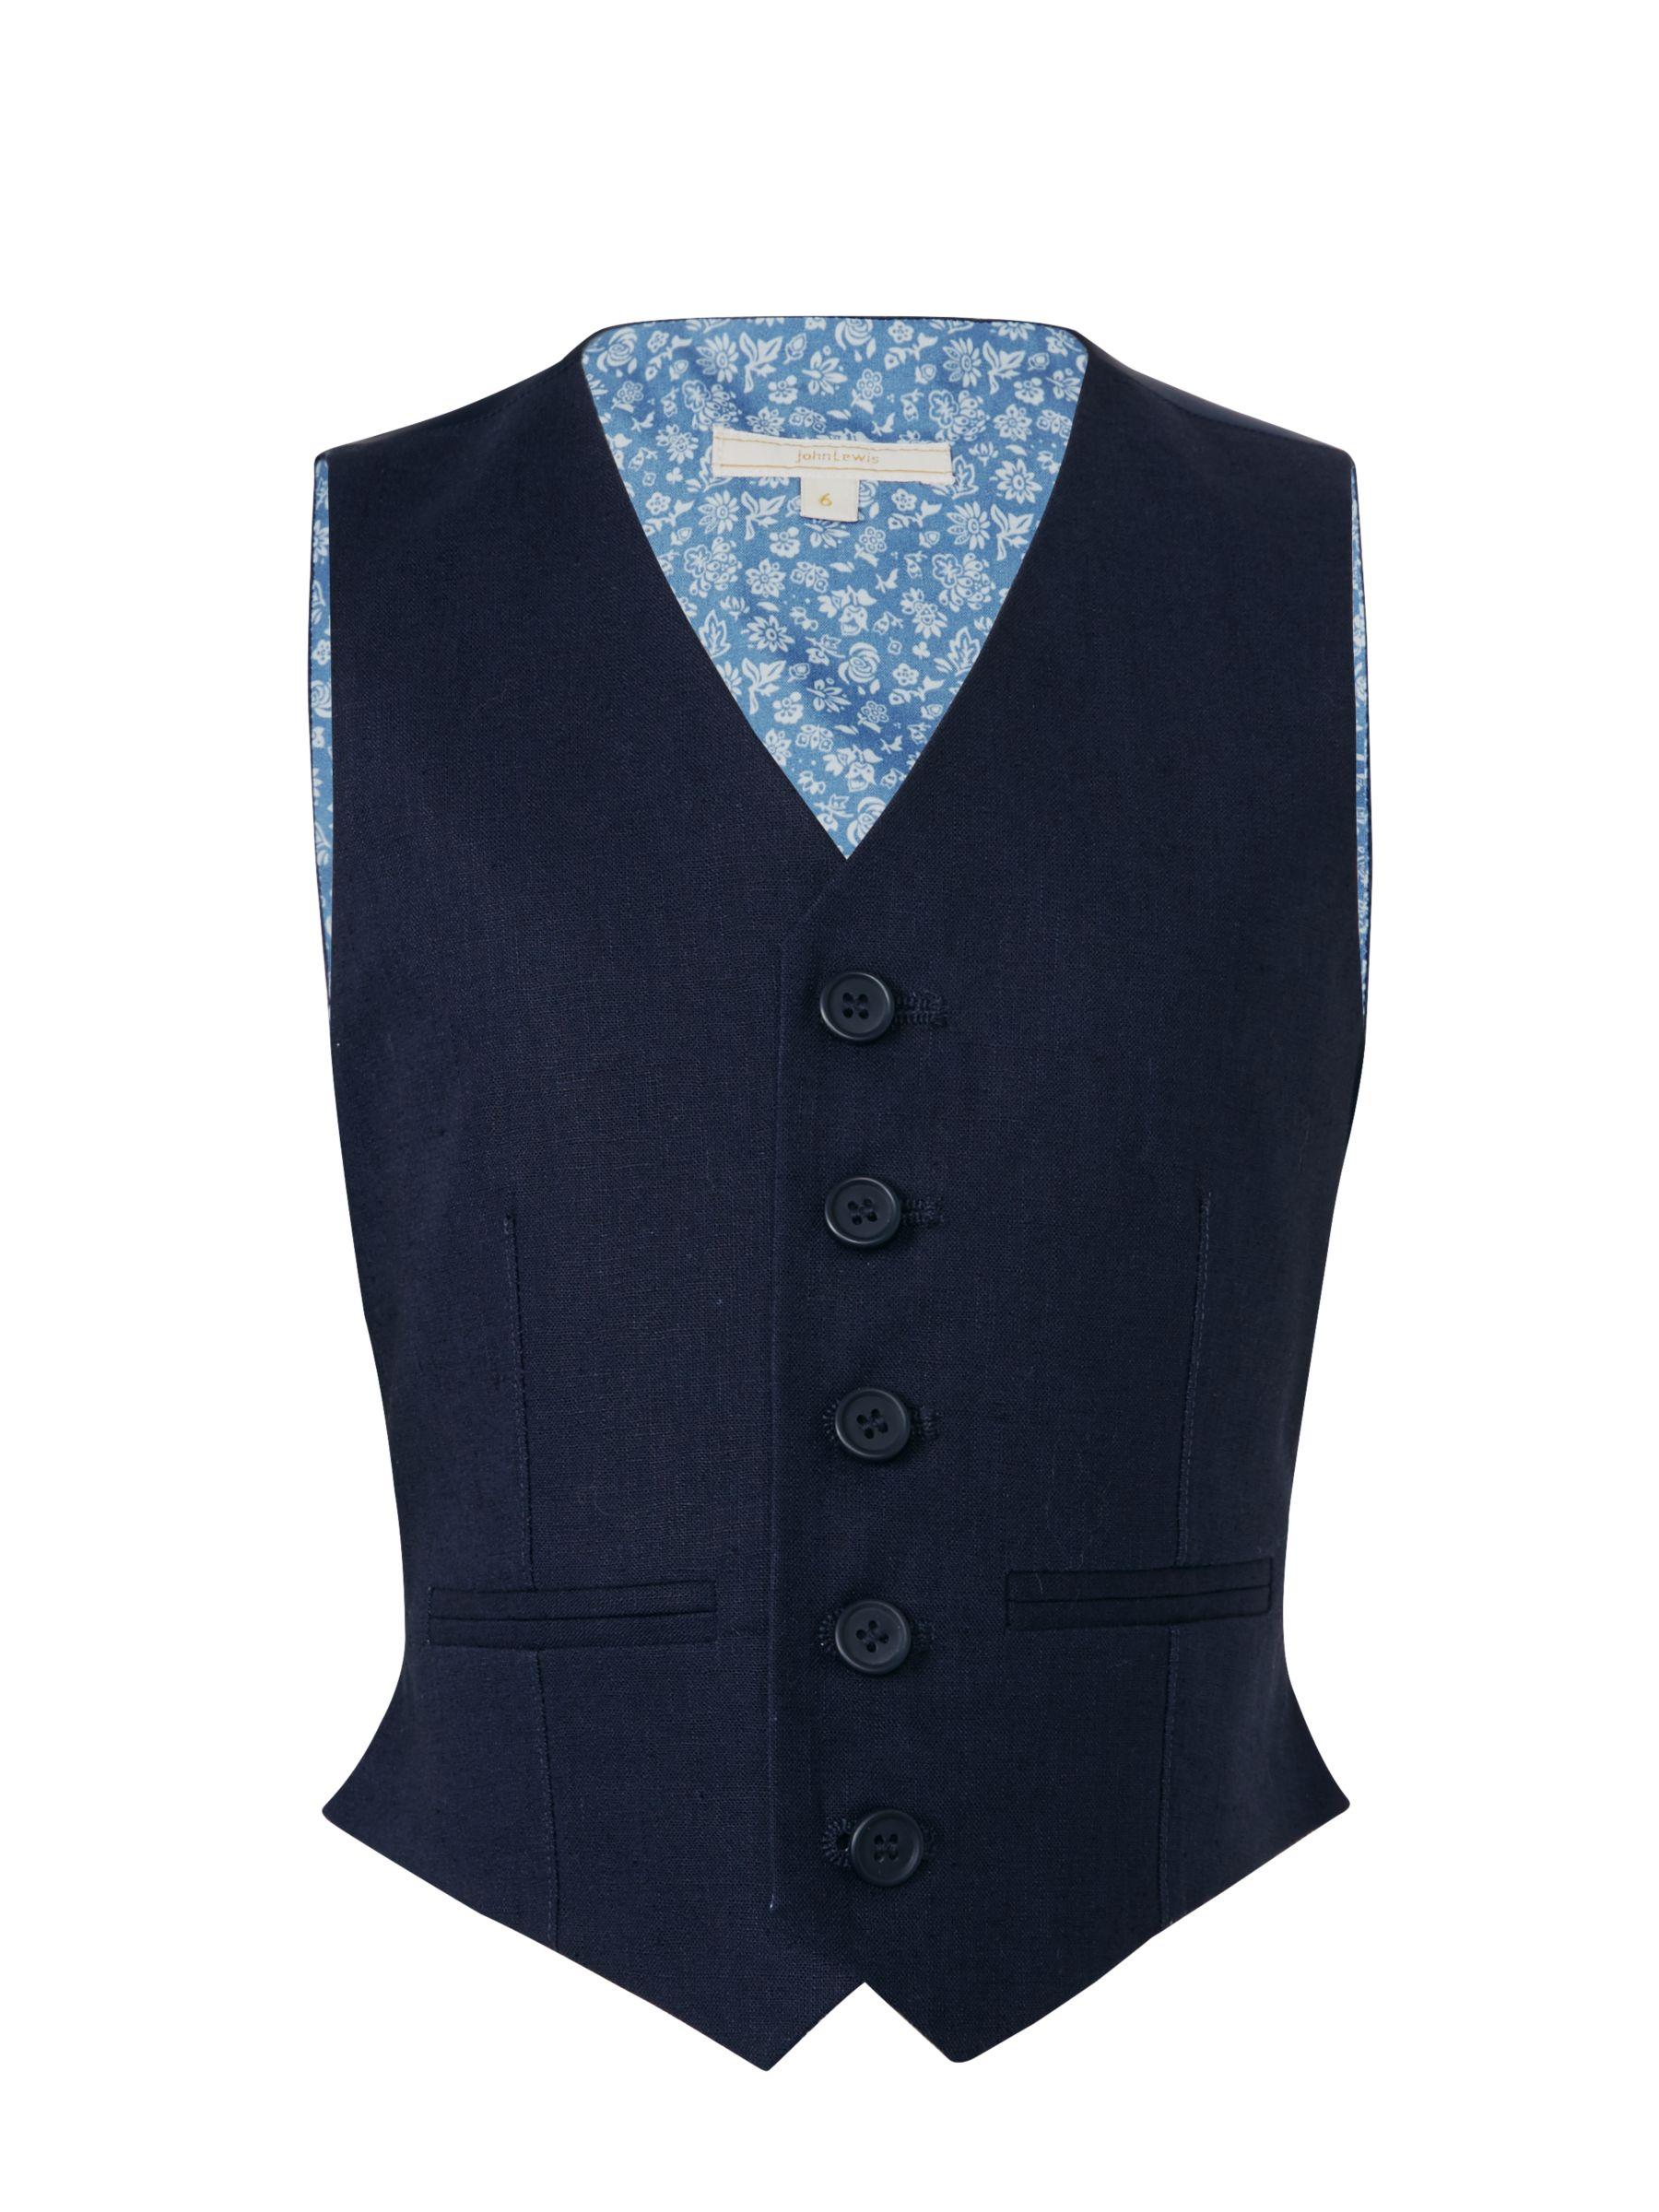 John Lewis Heirloom Collection John Lewis Heirloom Collection Boys' Linen Cotton Waistcoat